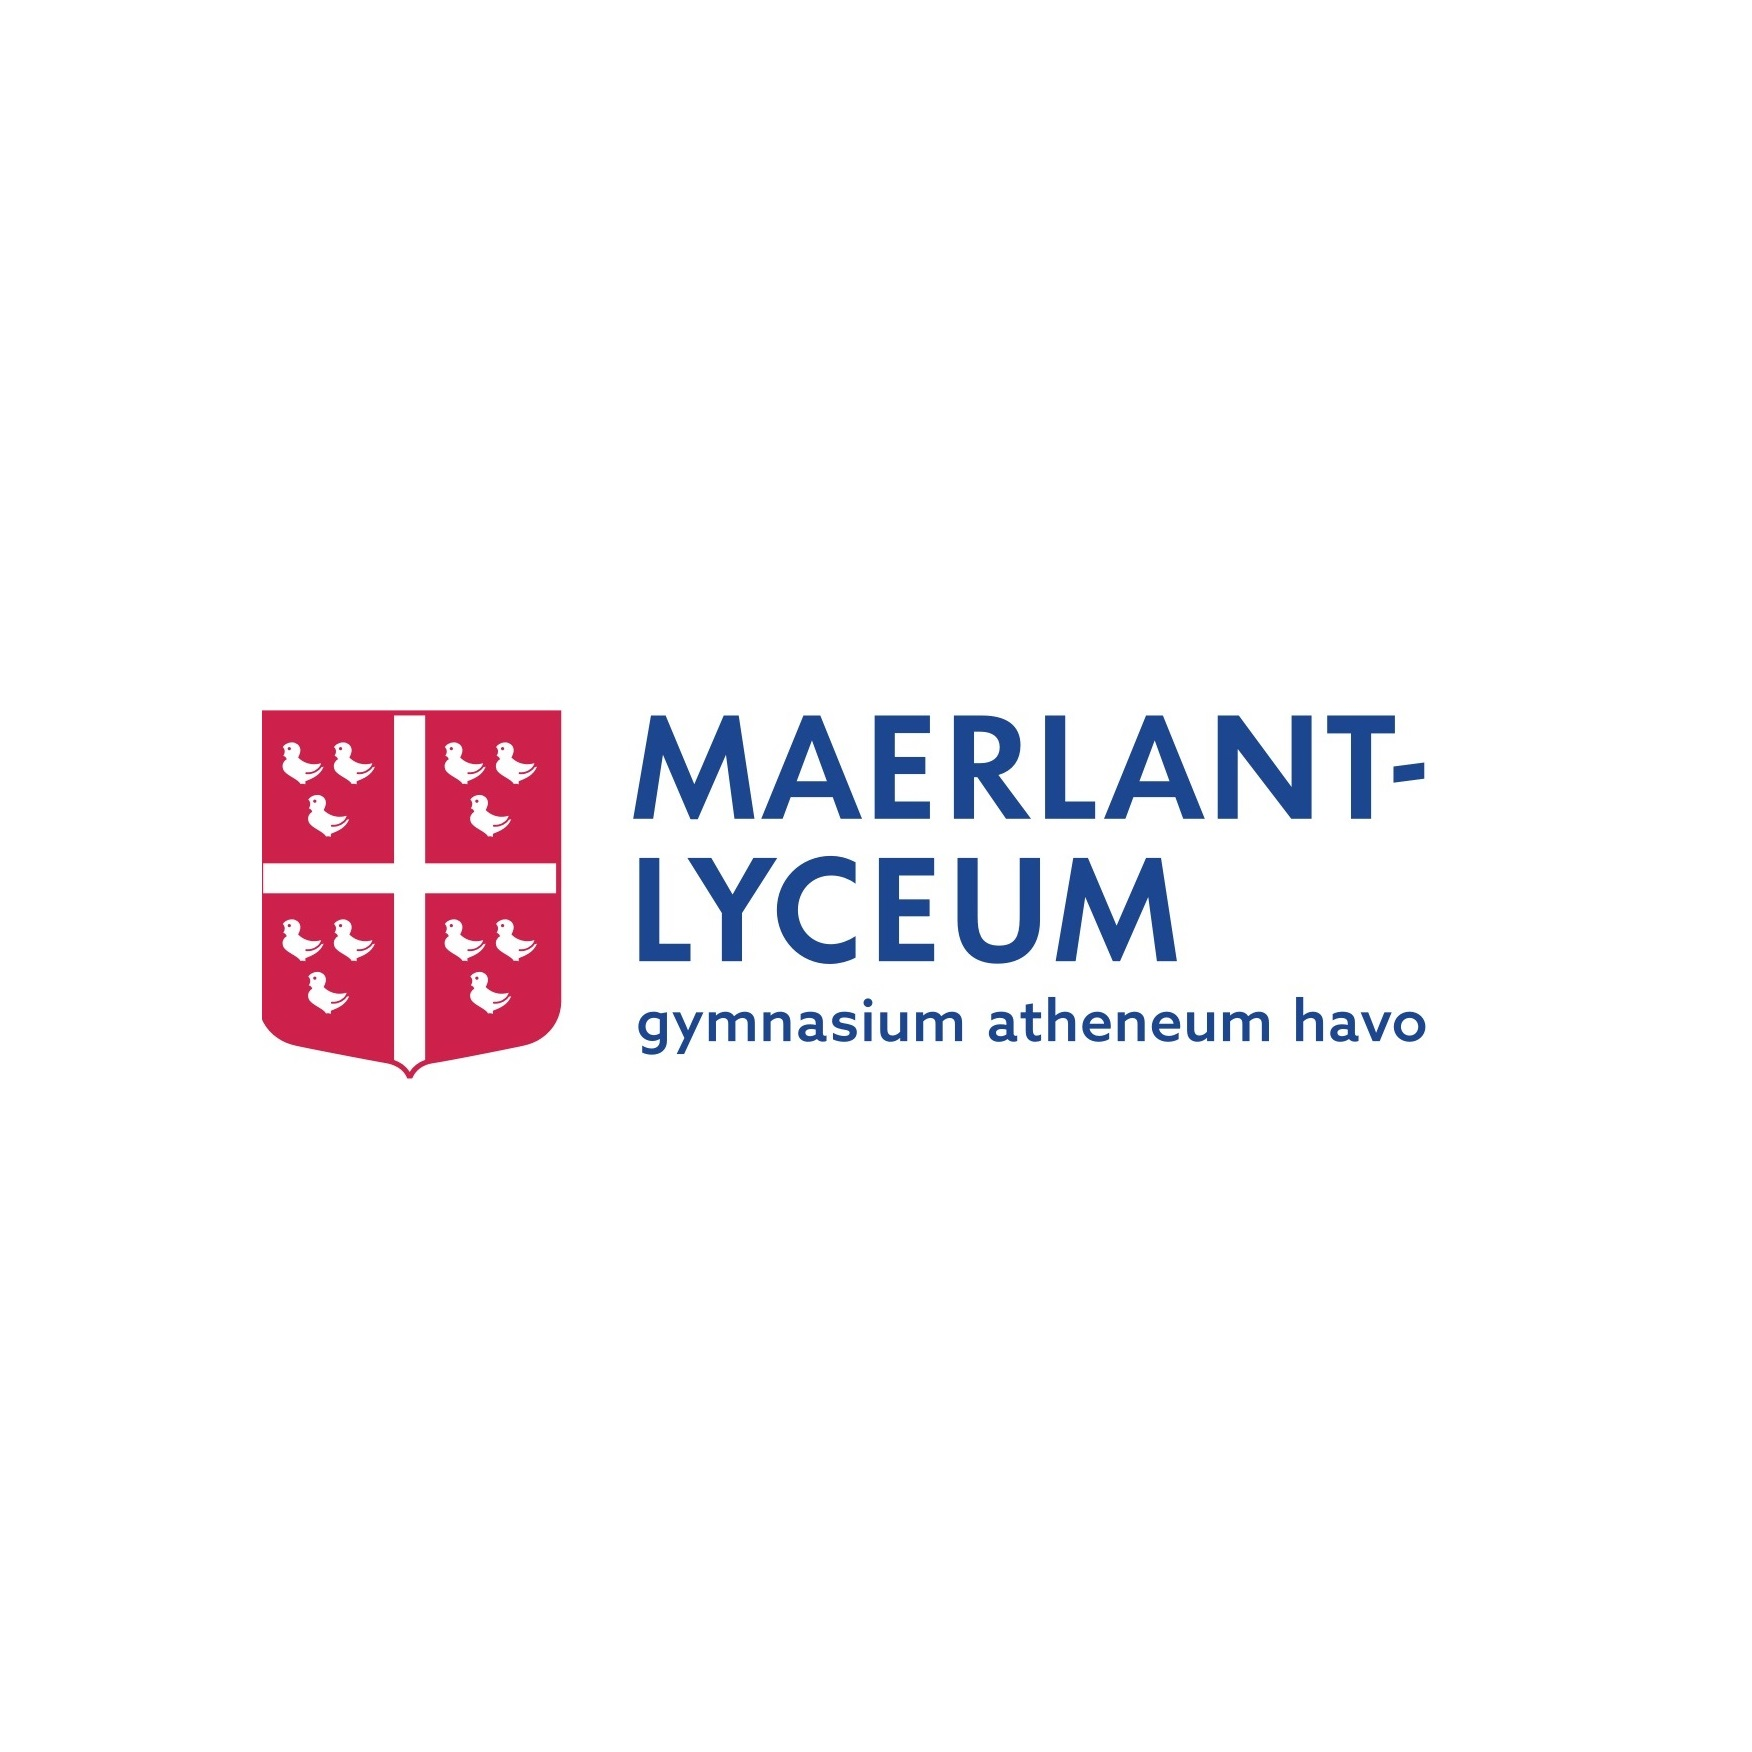 Maerlant Lyceum